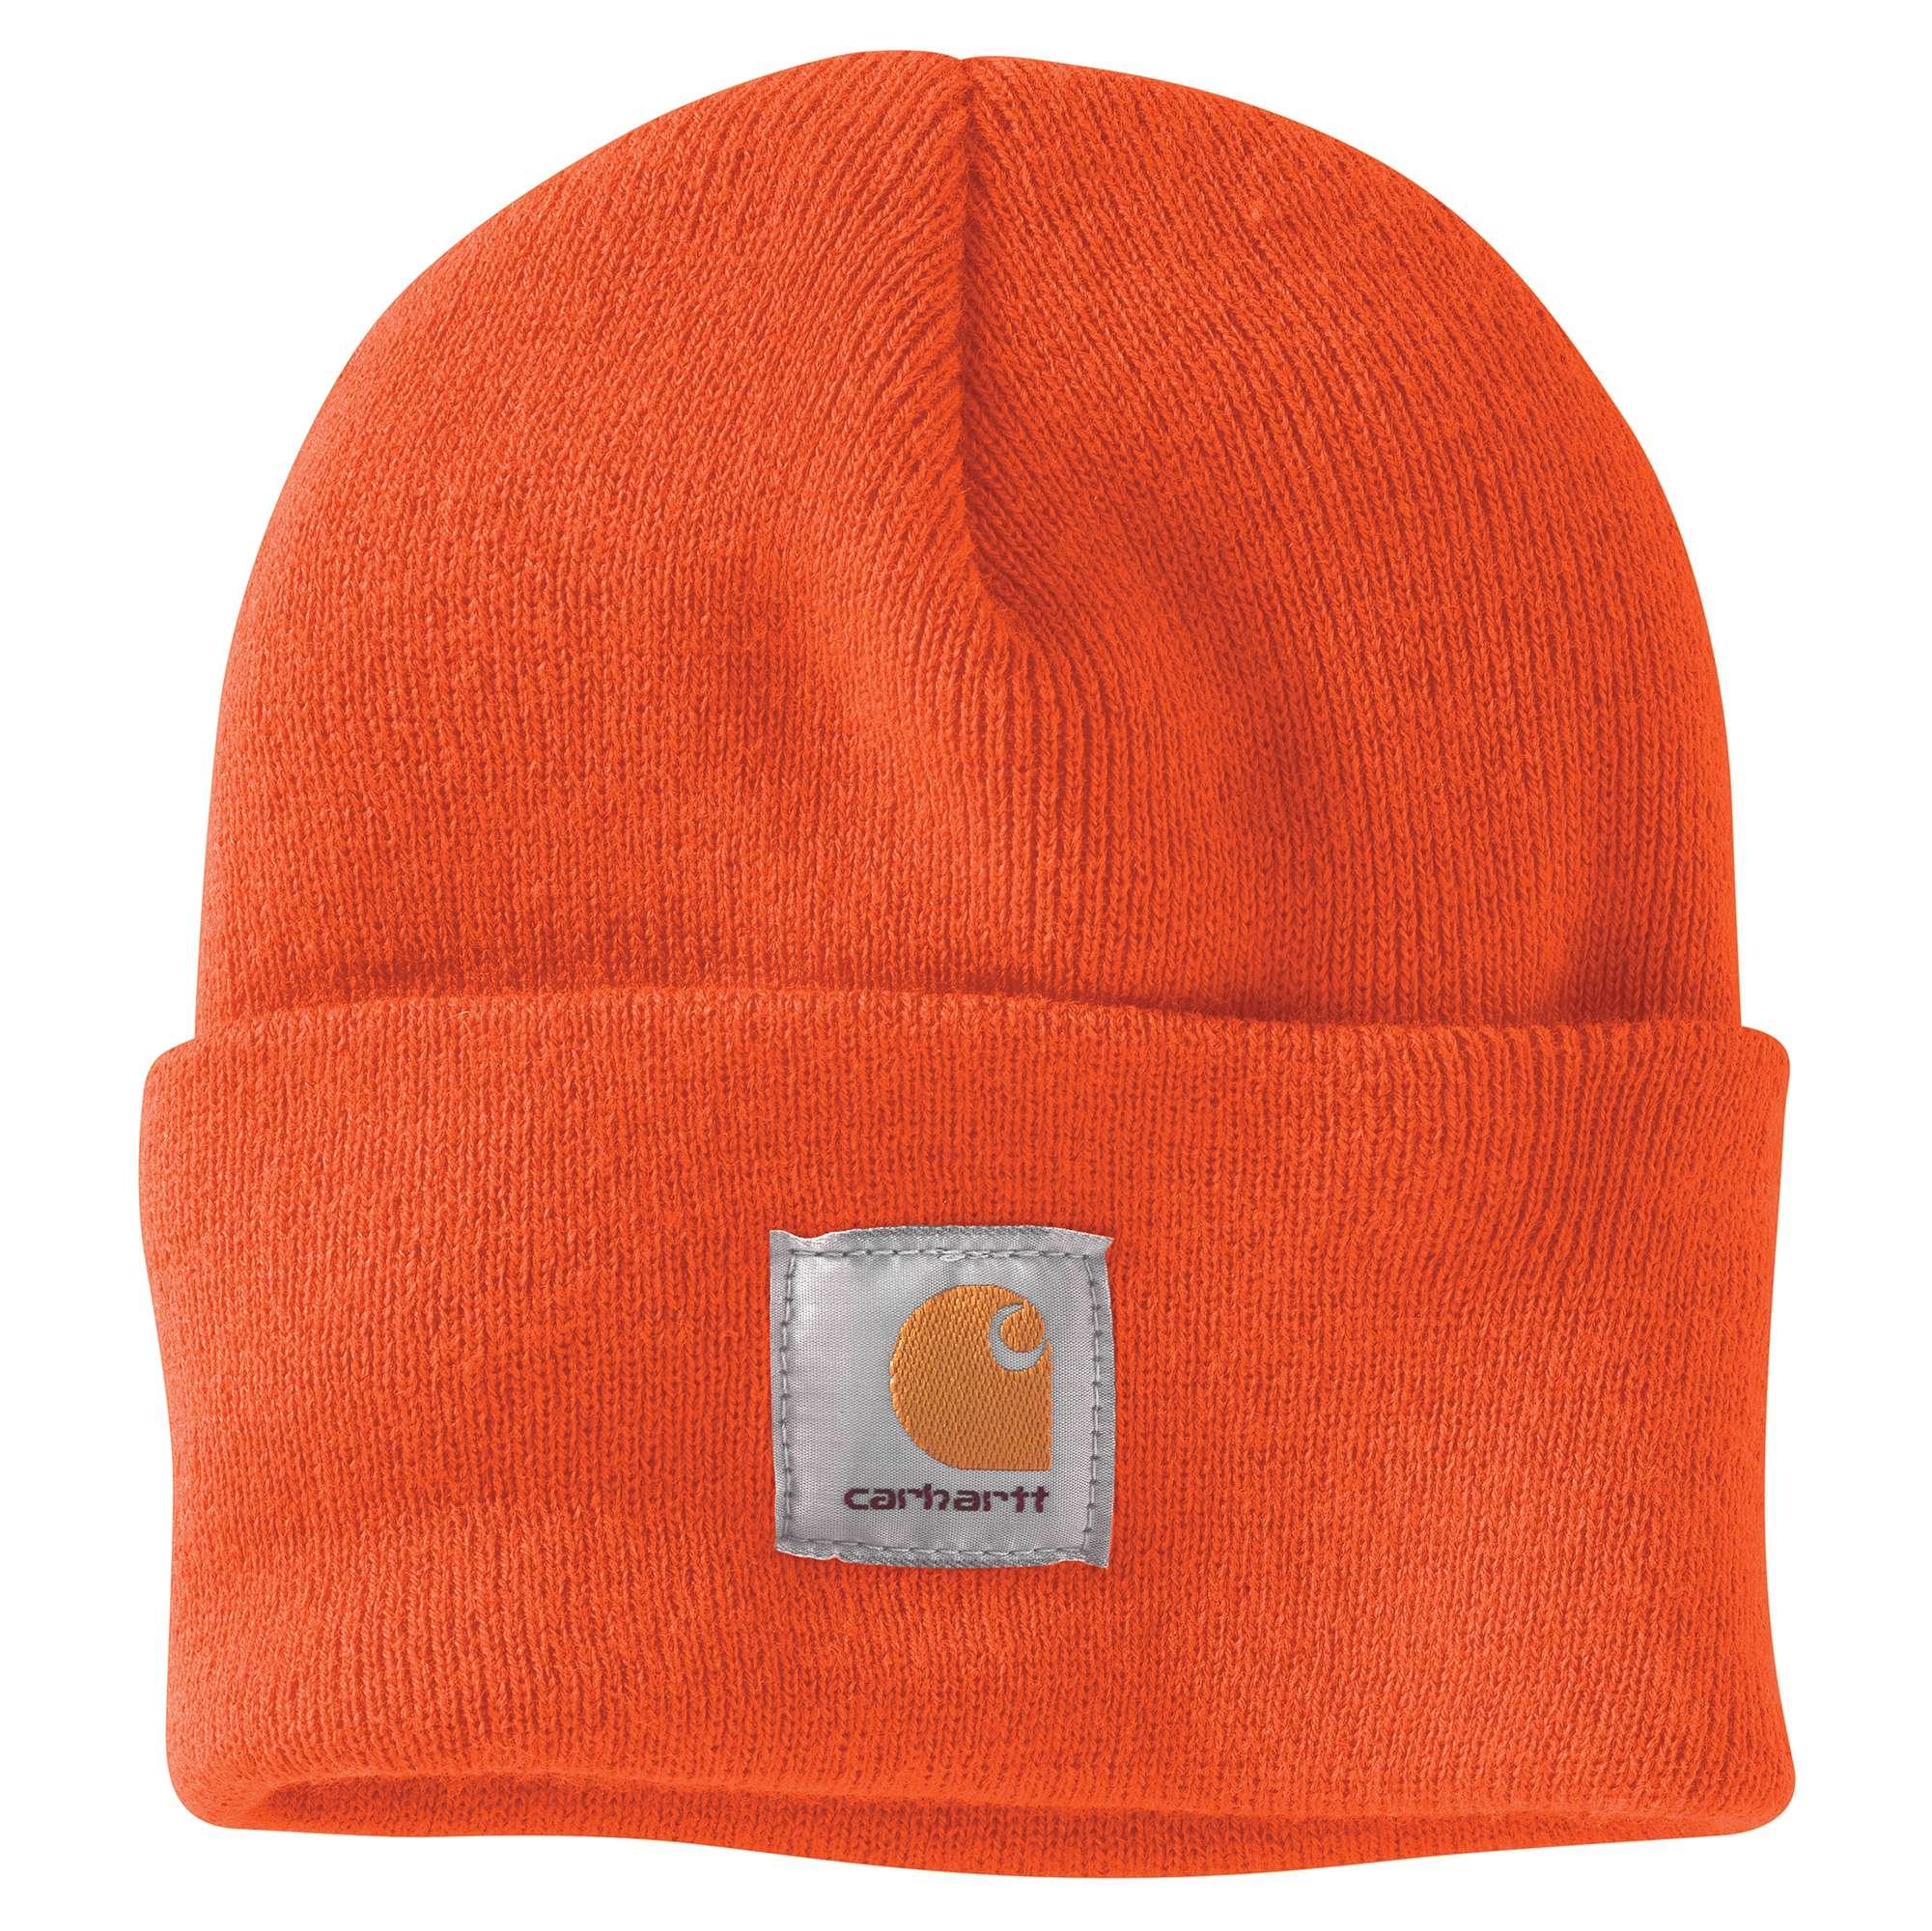 M Cotton Canvas Cap, Orange, swatch